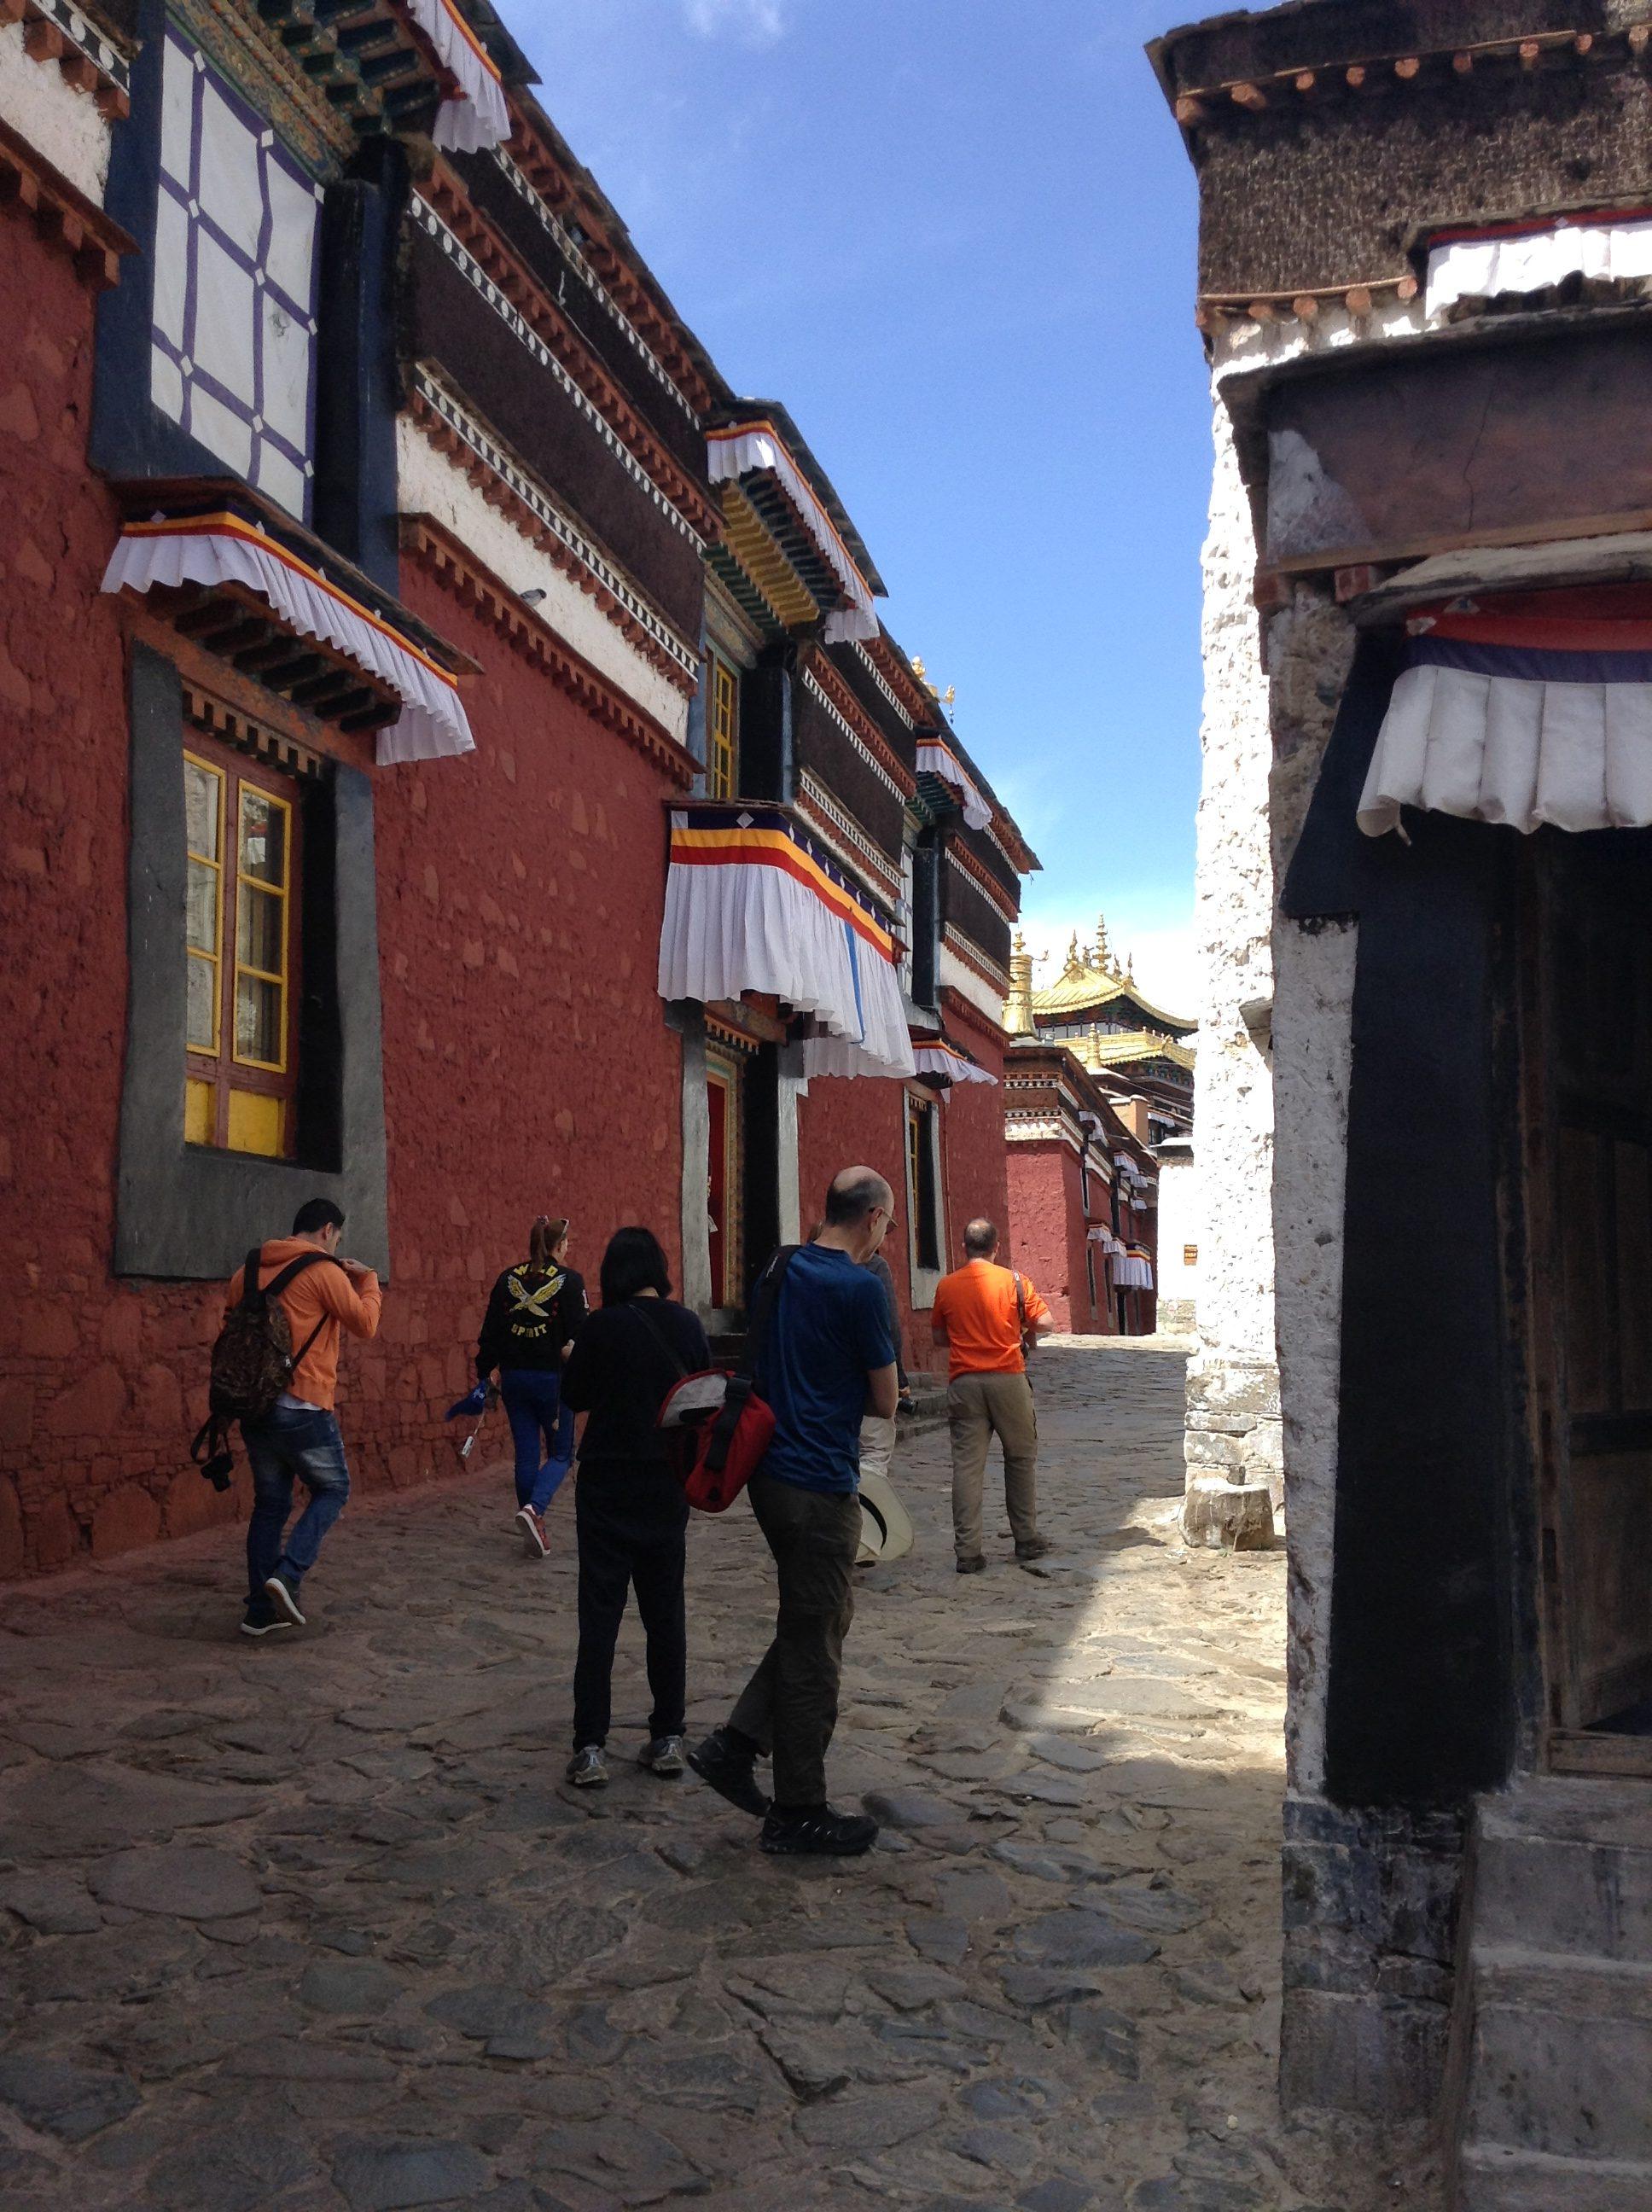 Tibet has many beautiful temples